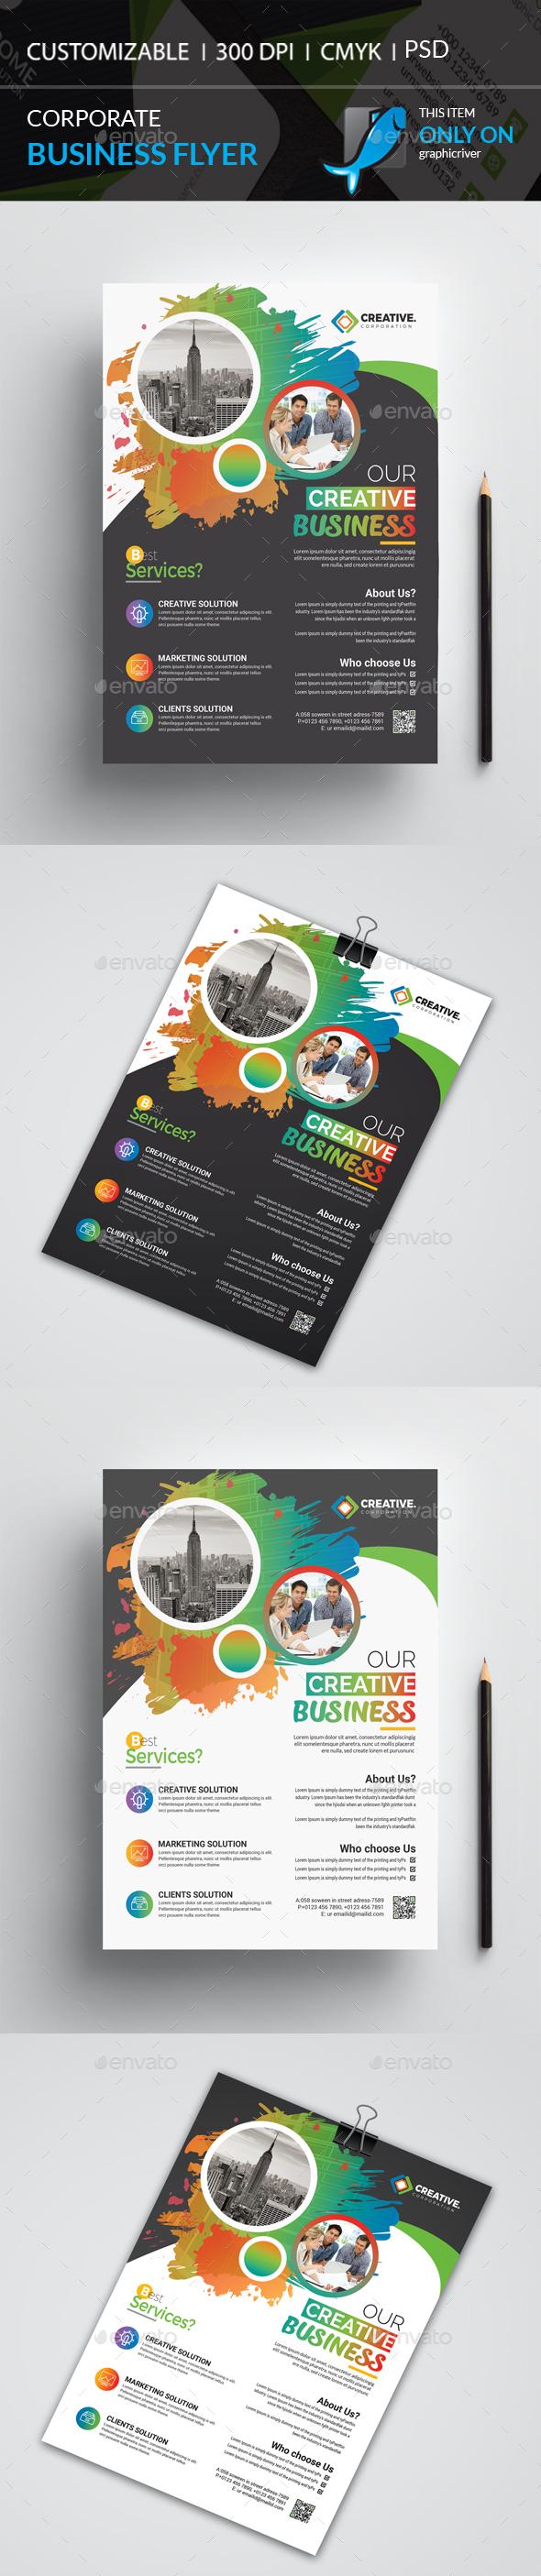 GraphicRiver Corporate Flyer 20974645